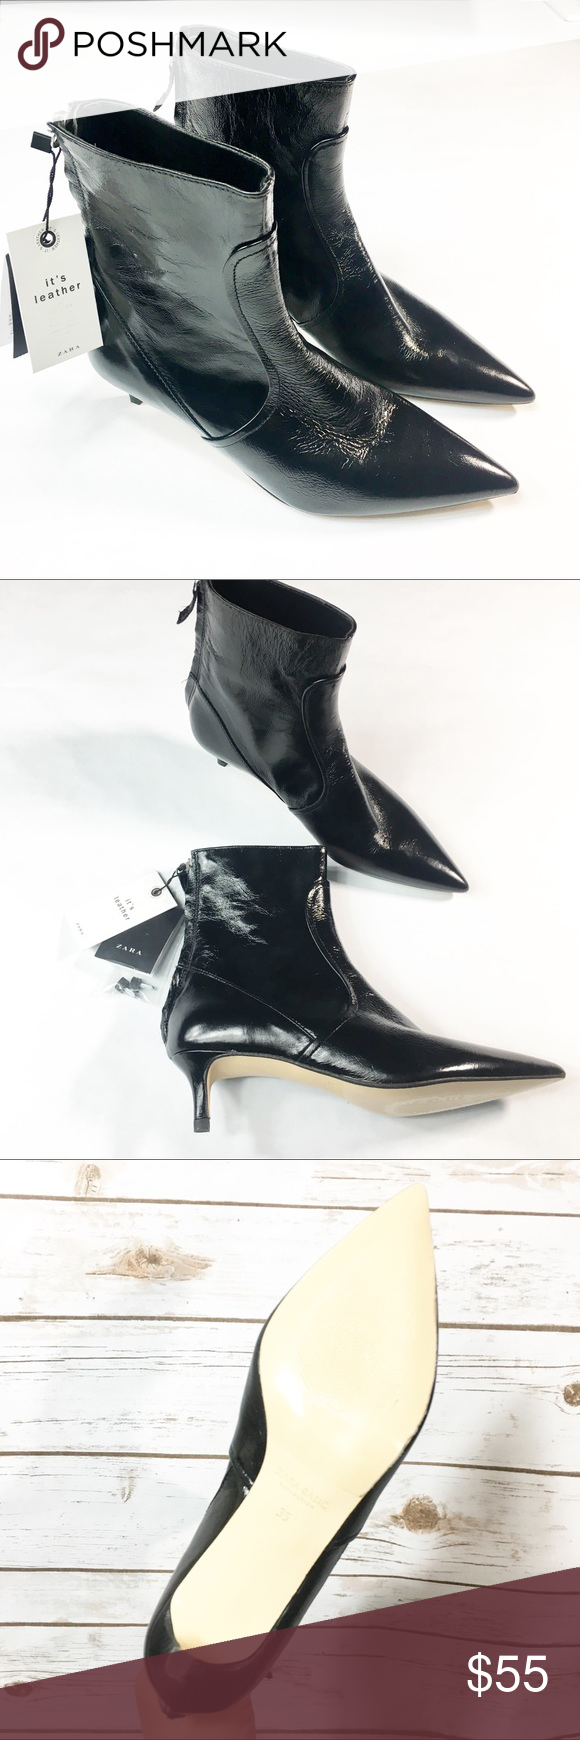 Zara Leather High Heel Ankle Boots High Heel Boots Ankle Heels Leather High Heels